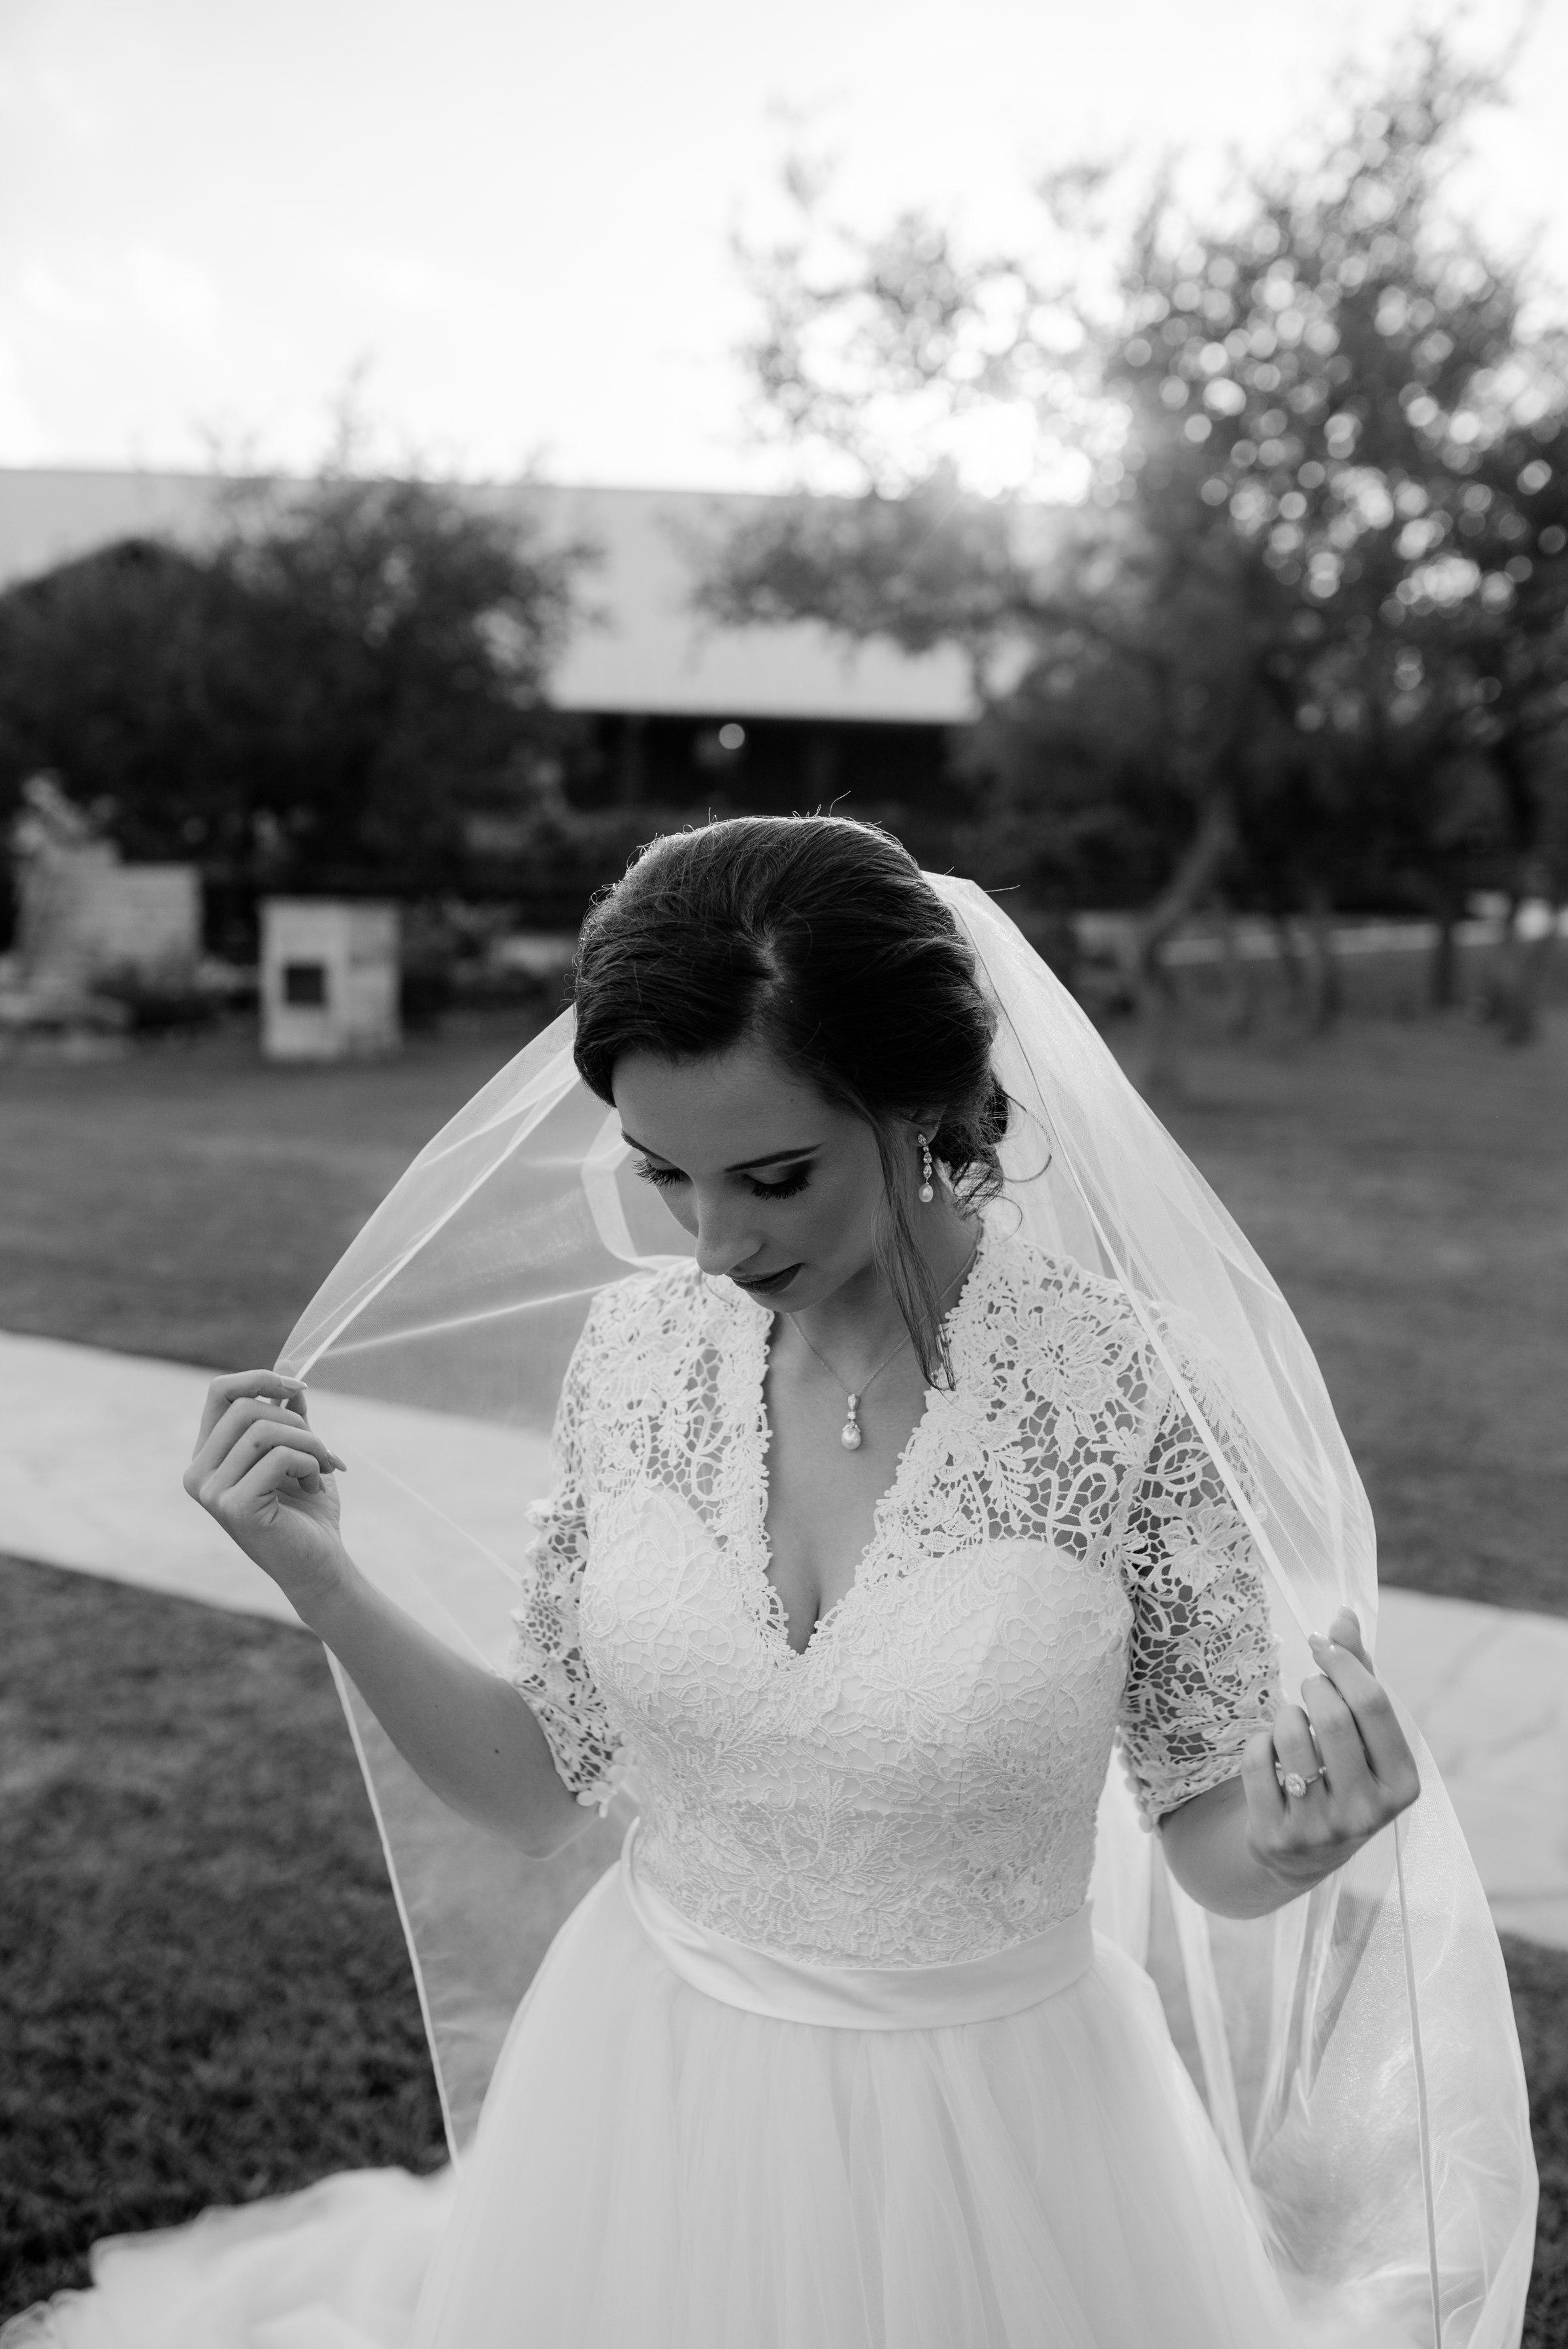 austin-minneapolis-wedding-engagement-elopement-bridals-prices-best-senior-photographer-destination-elopement-milestone-texas-dallas-houston-lexi_0027.jpg